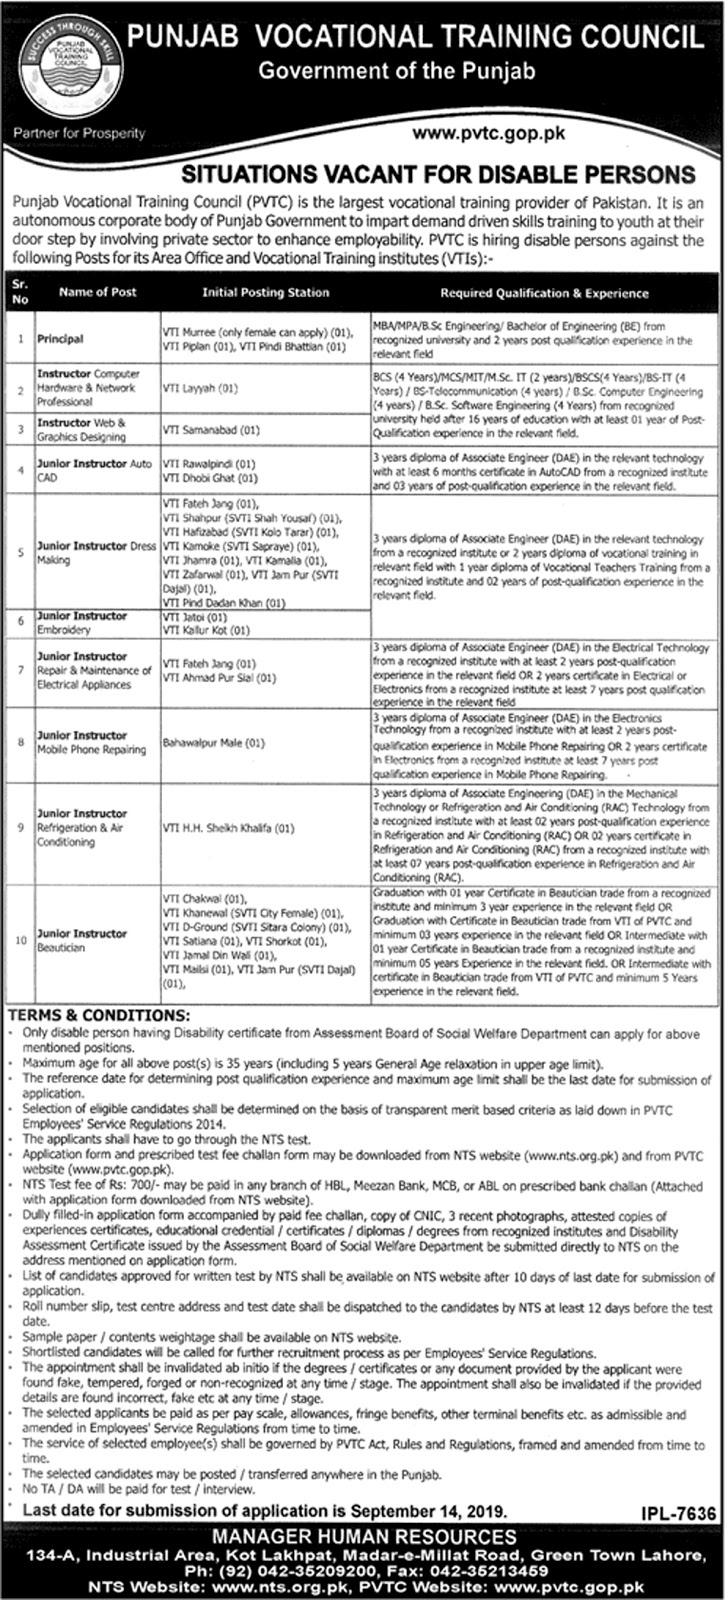 Punjab Vocational Training Council Jobs NTS 2019 August